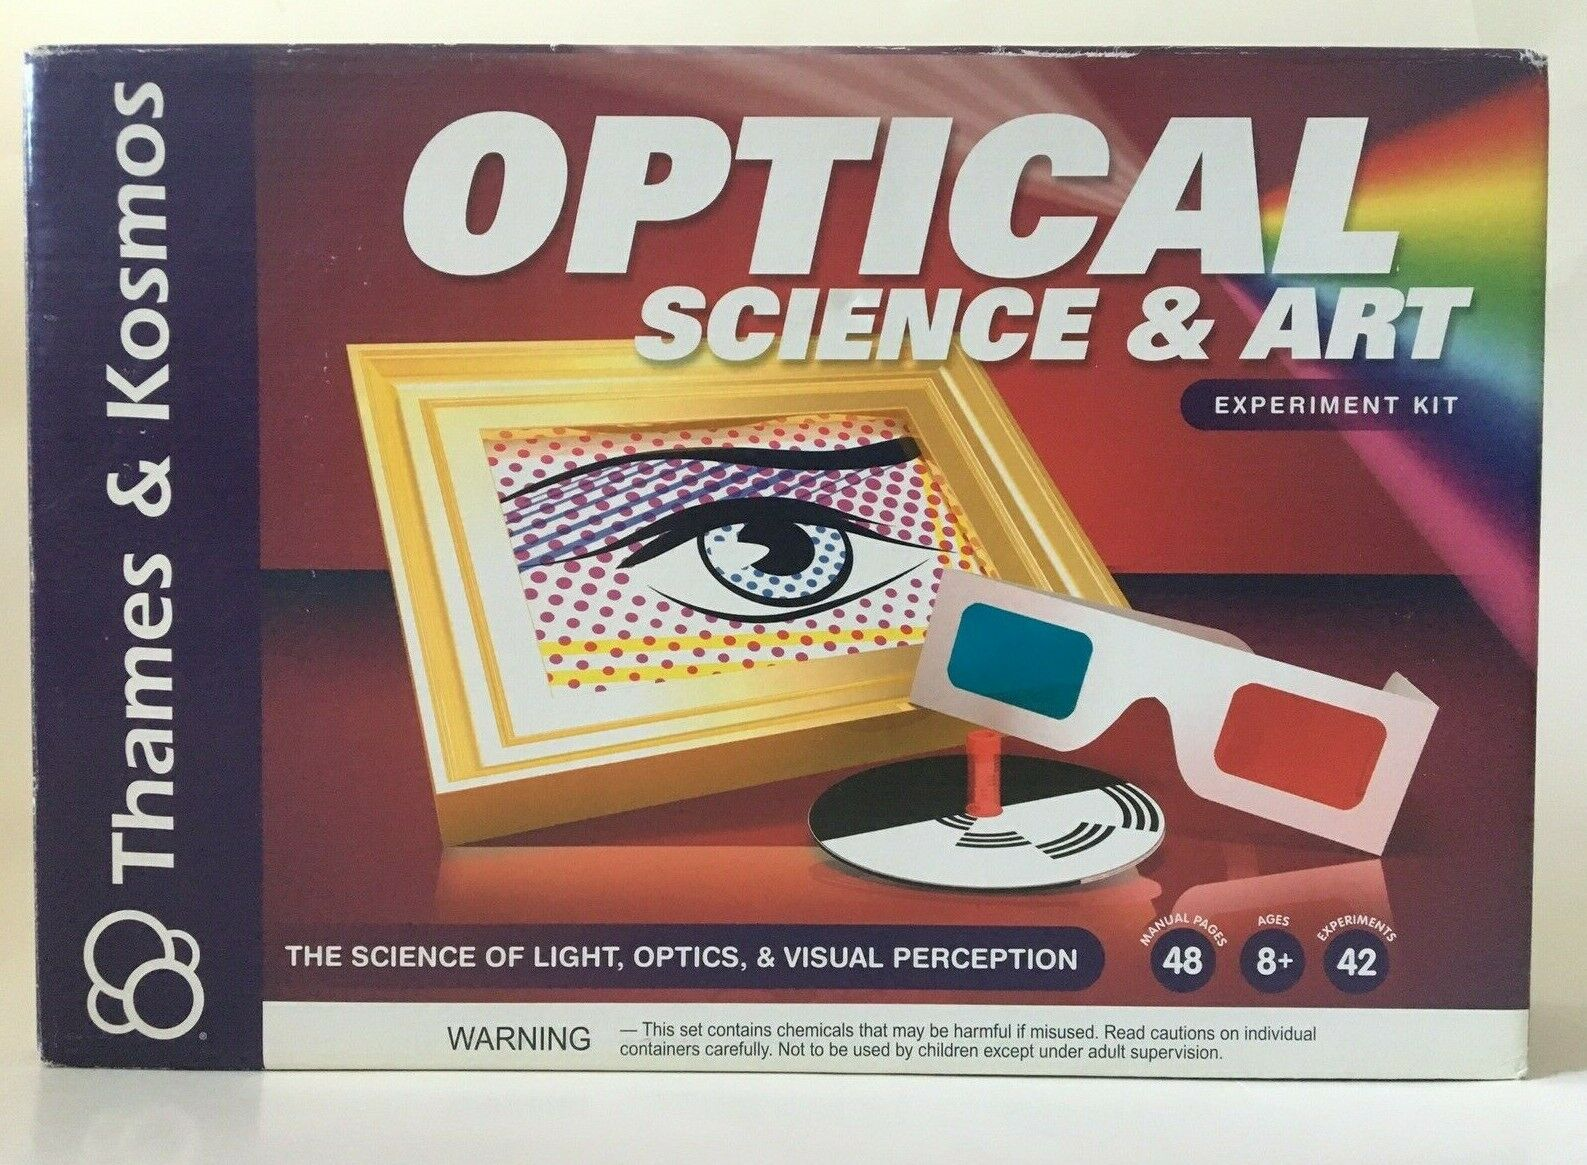 OPTICAL SCIENCE & ART EXPERIMENT KIT EDUCATIONAL STEM TOY THAMES & KOSMOS -NEW!! 2